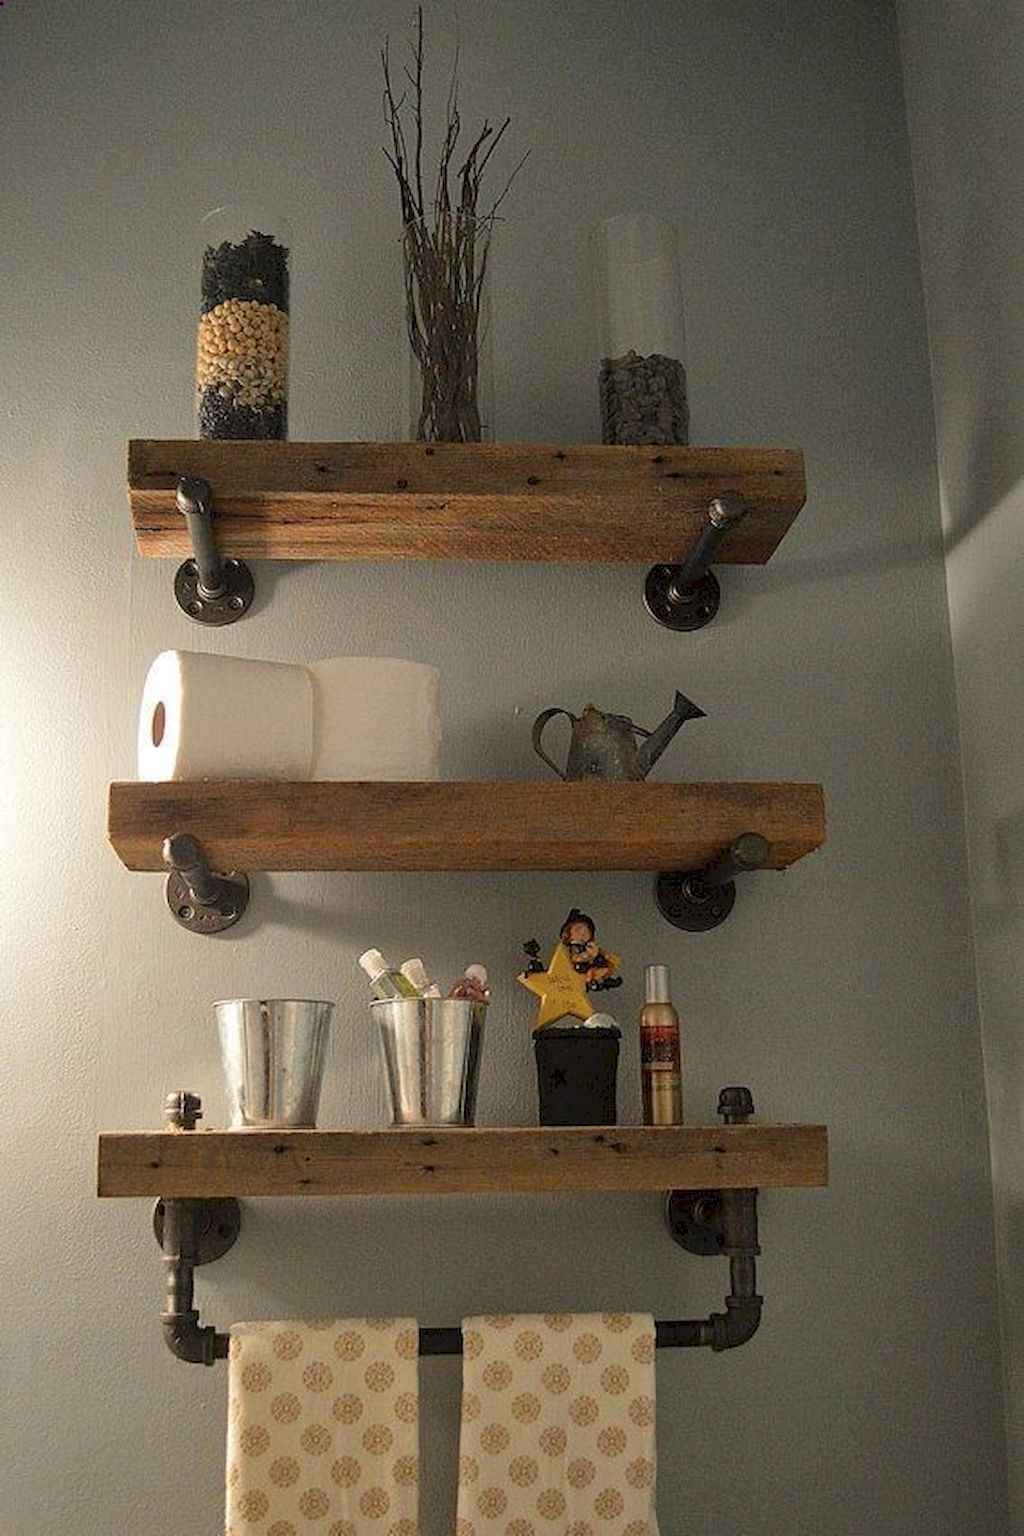 Cool bathroom storage shelves organization ideas (25)